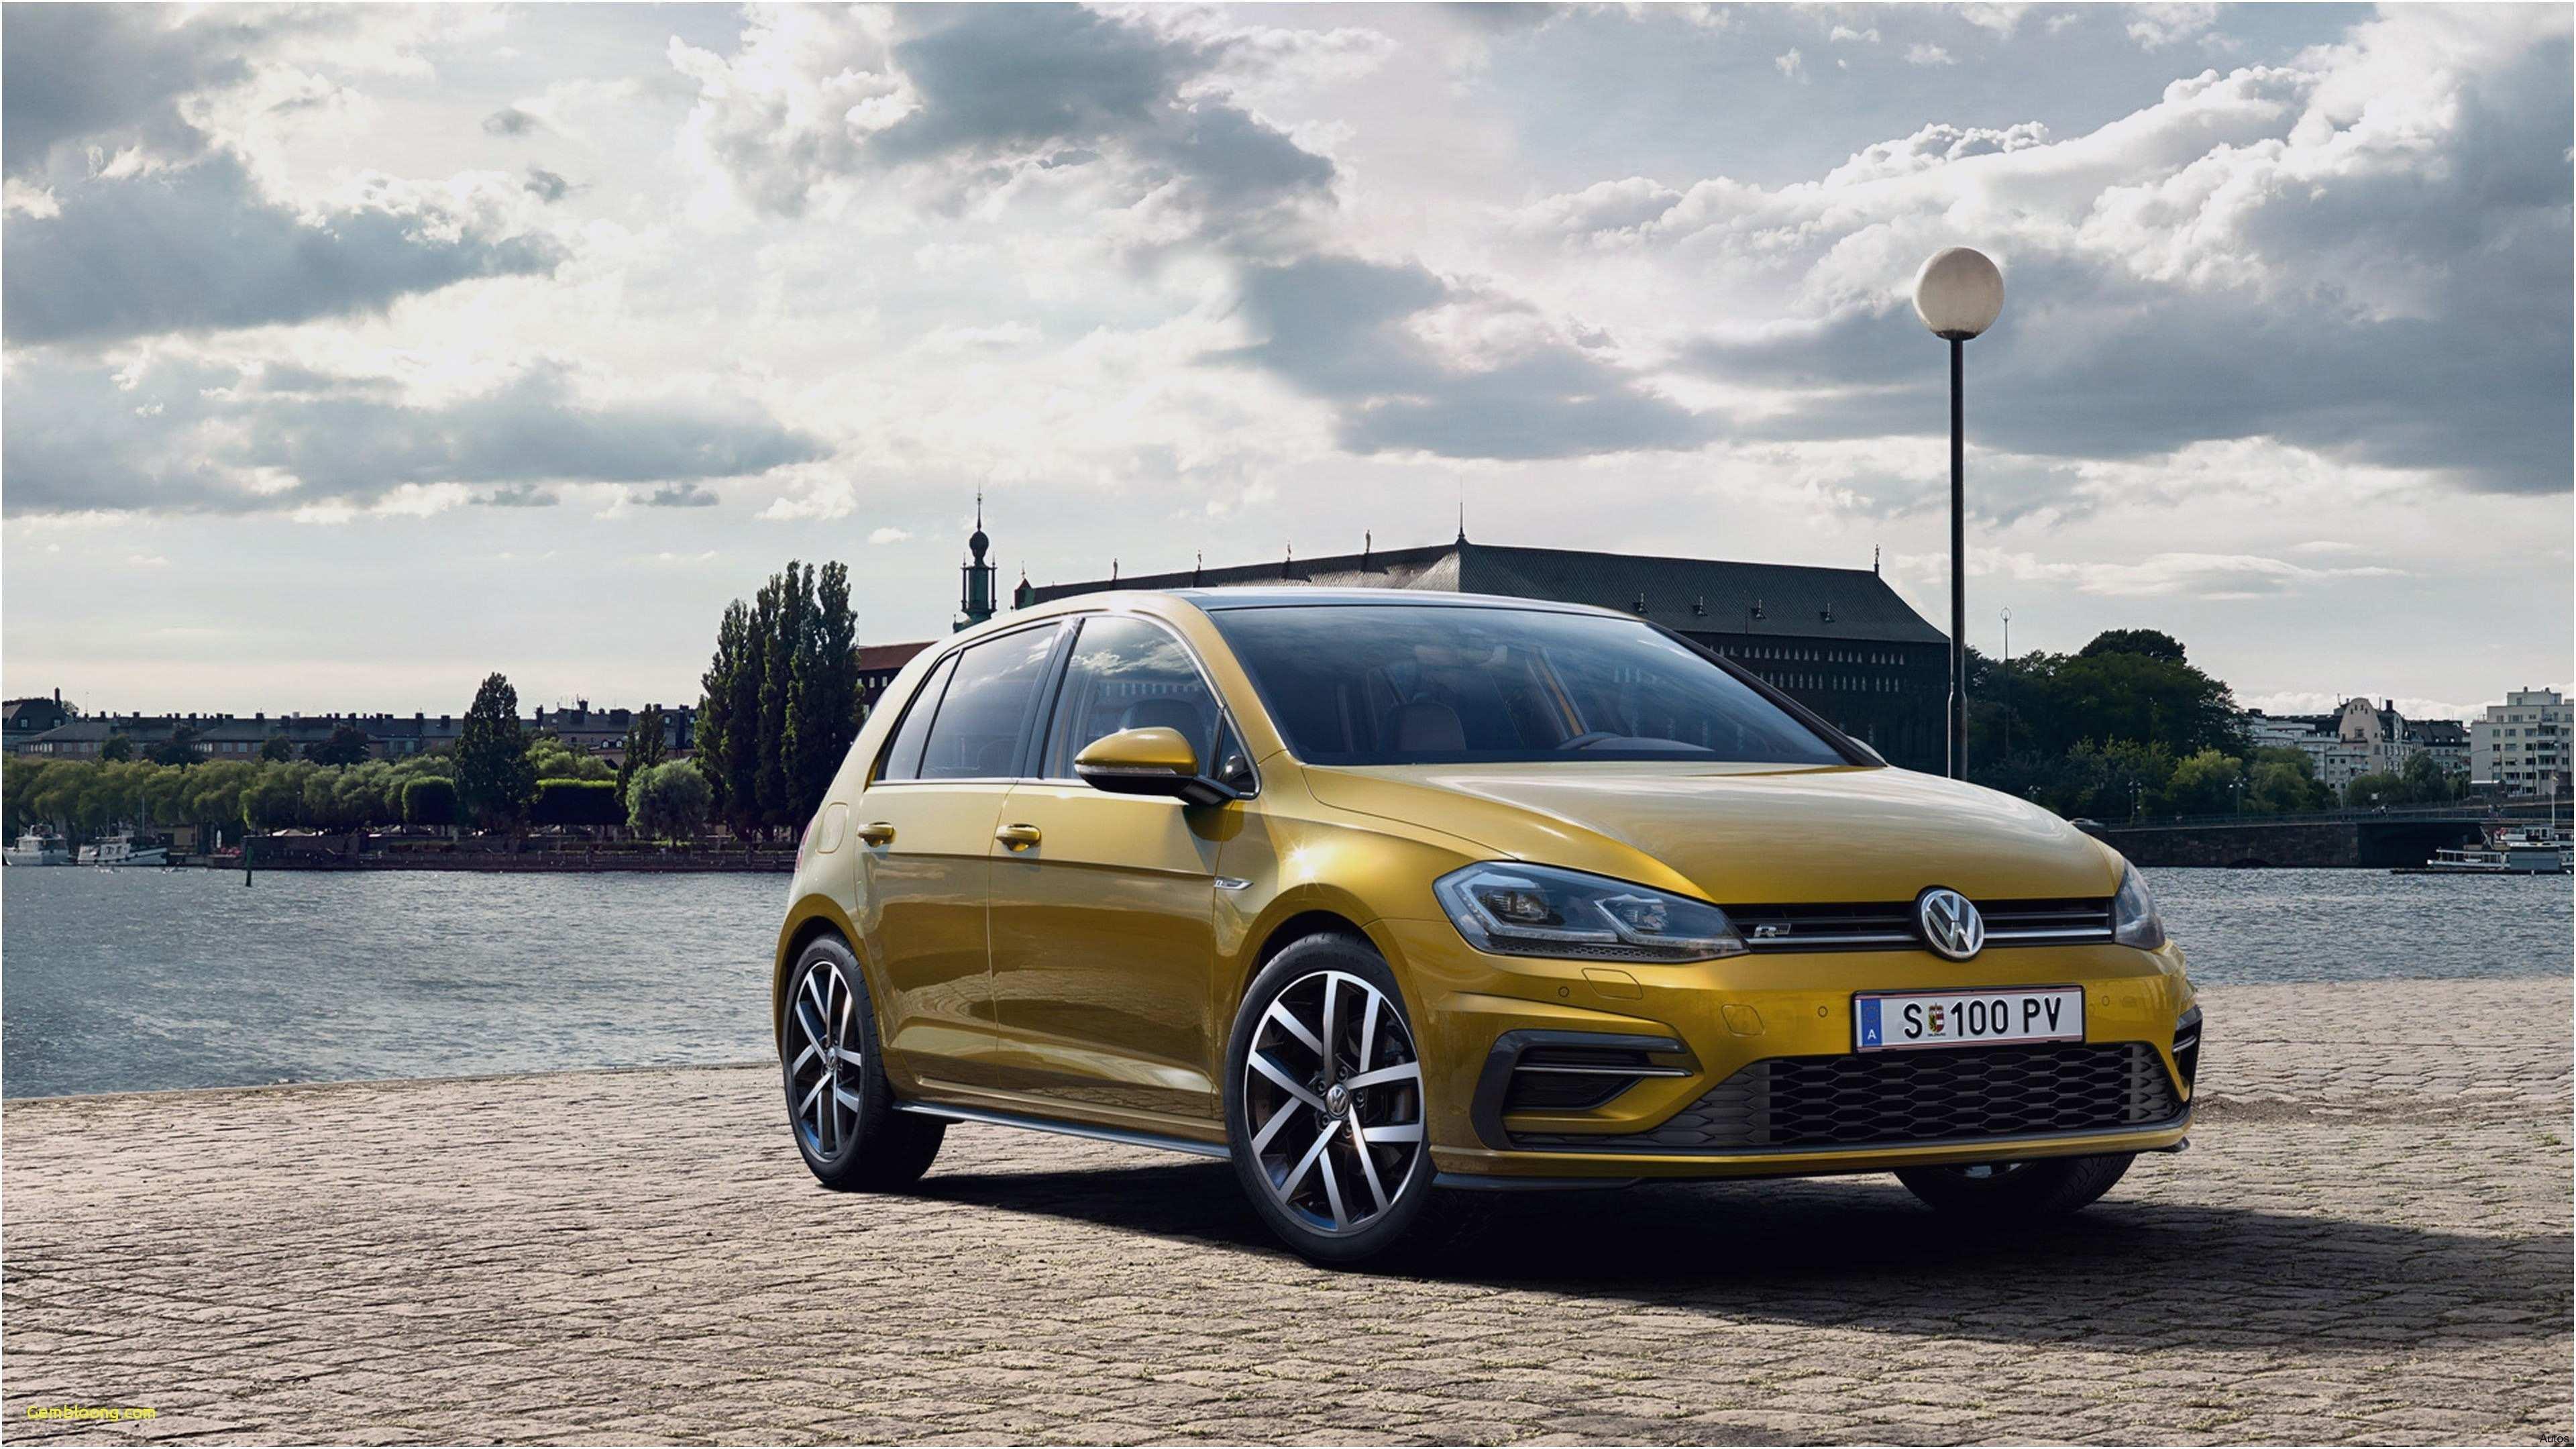 63 Gallery of 2020 Volkswagen Golf GTD Price with 2020 Volkswagen Golf GTD